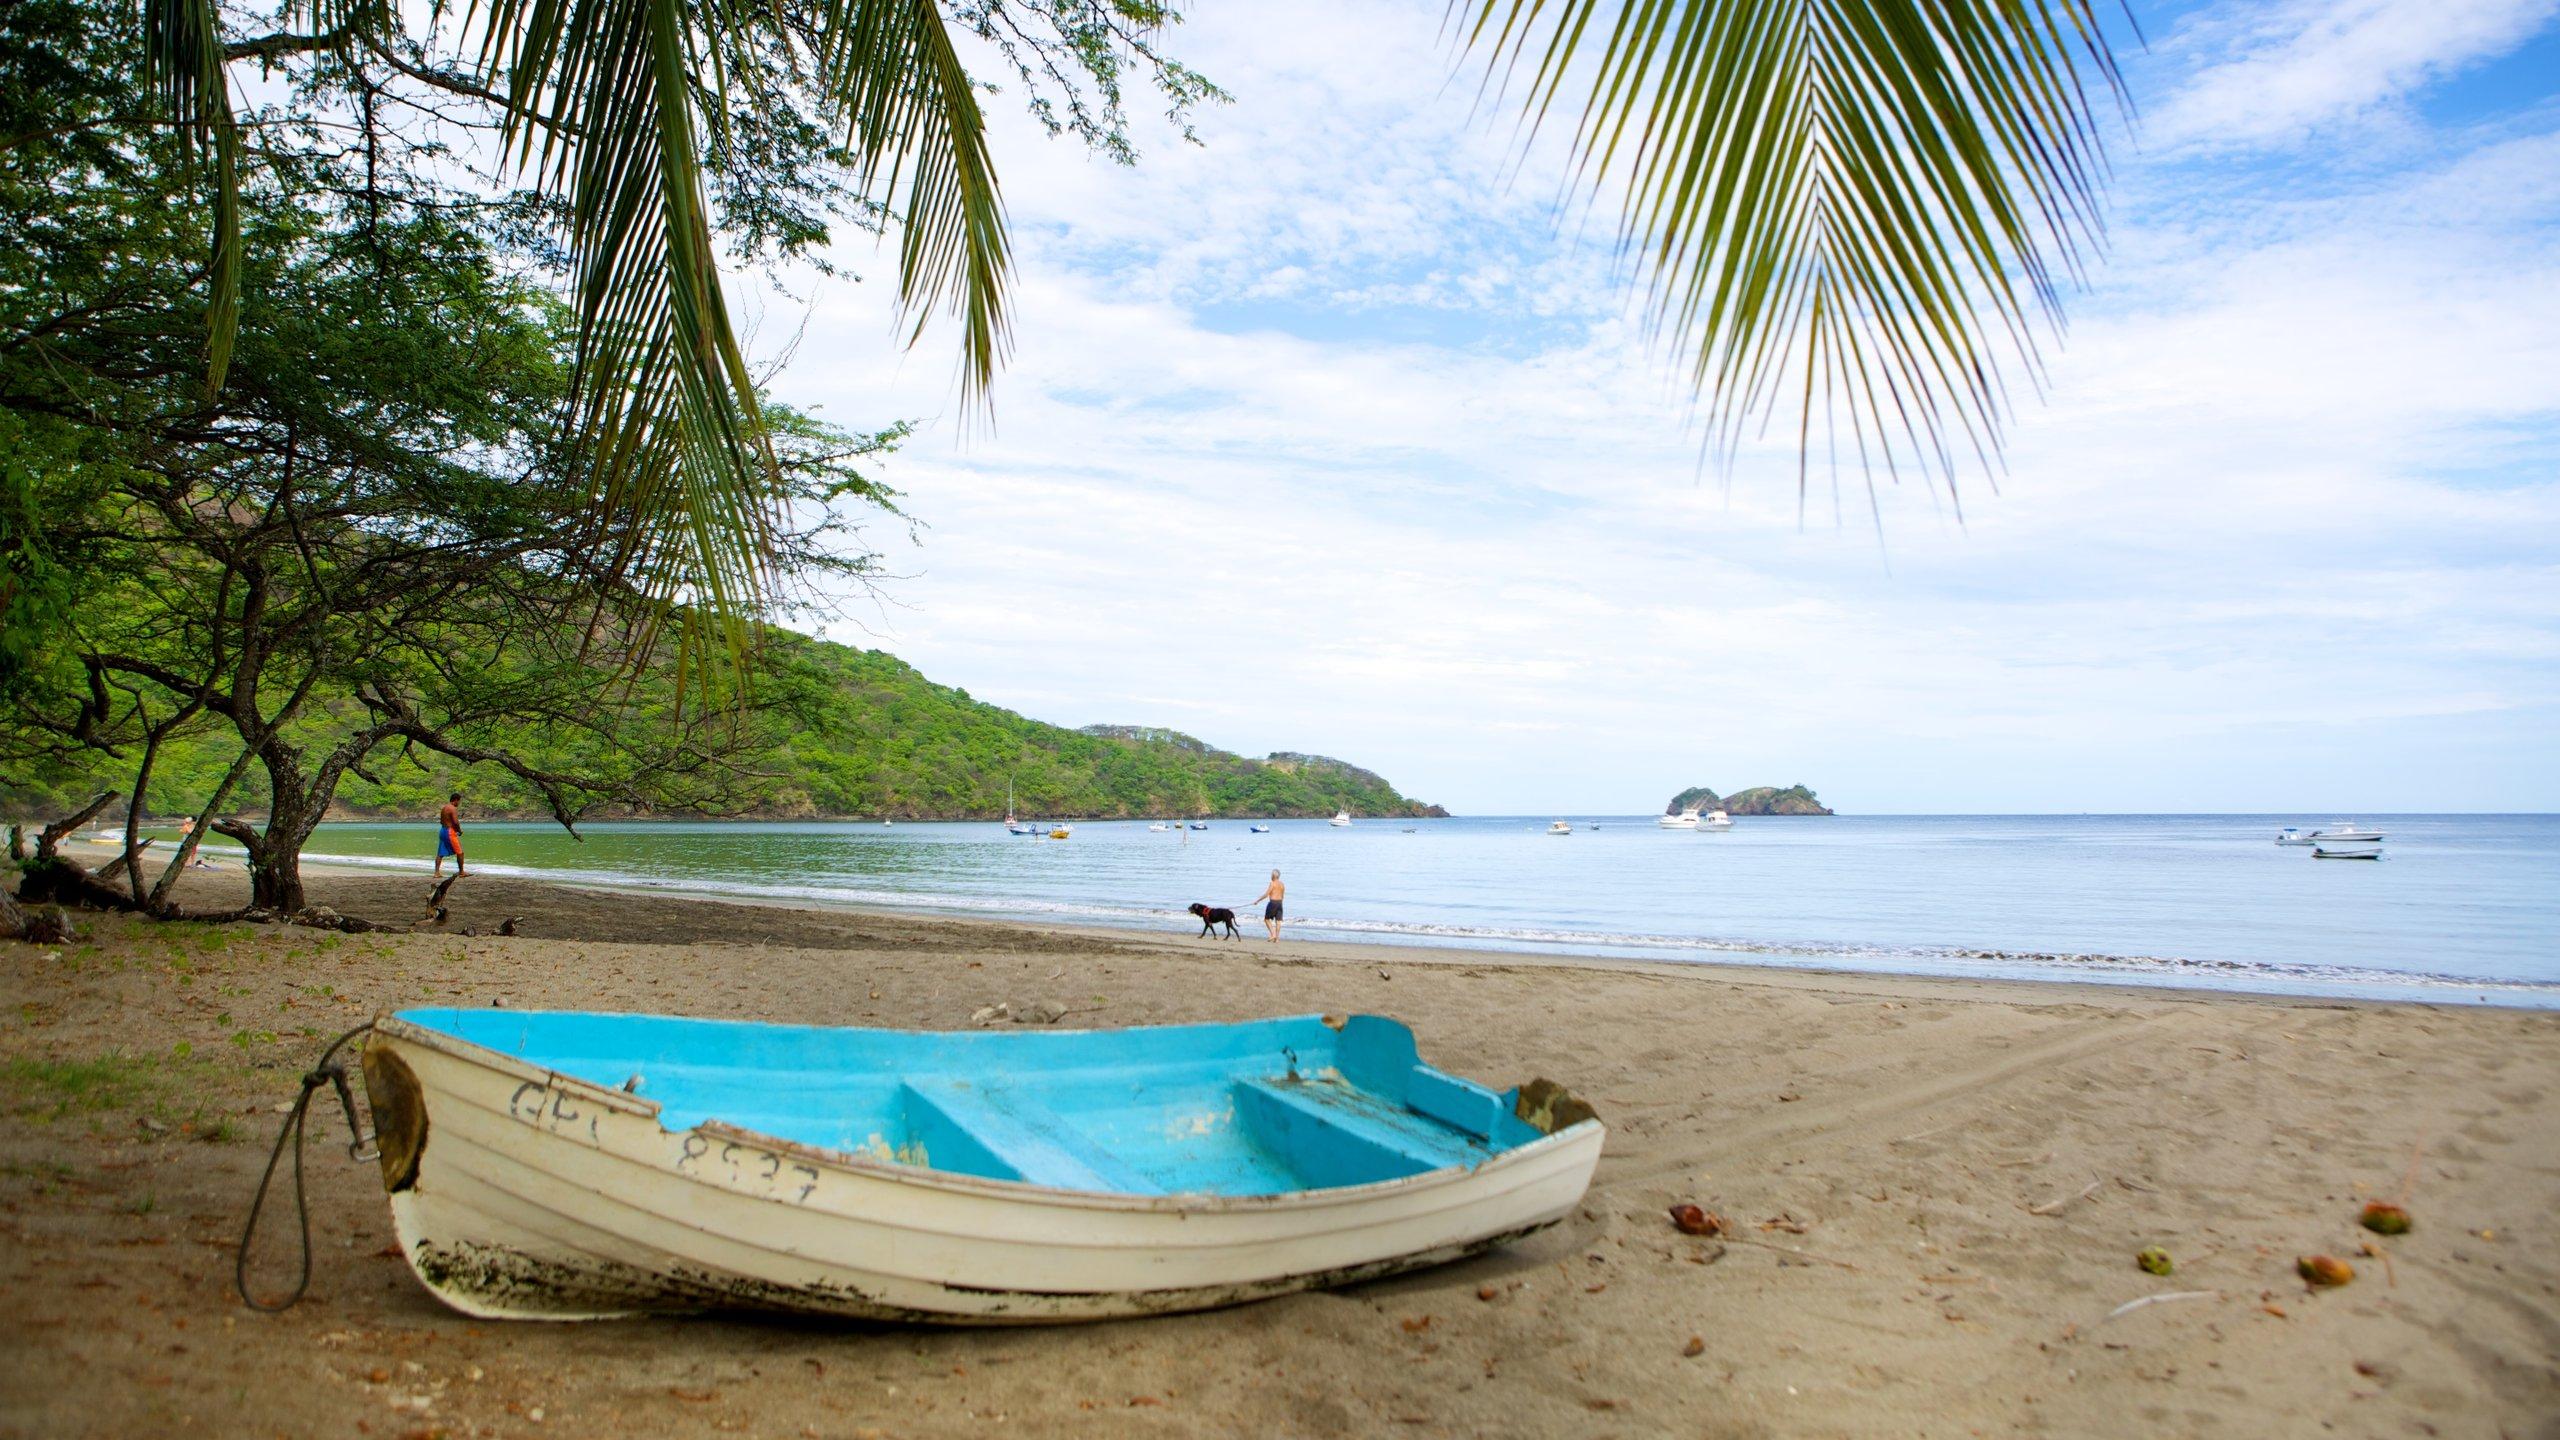 Playa Hermosa, Playa Hermosa, Guanacaste, Costa Rica